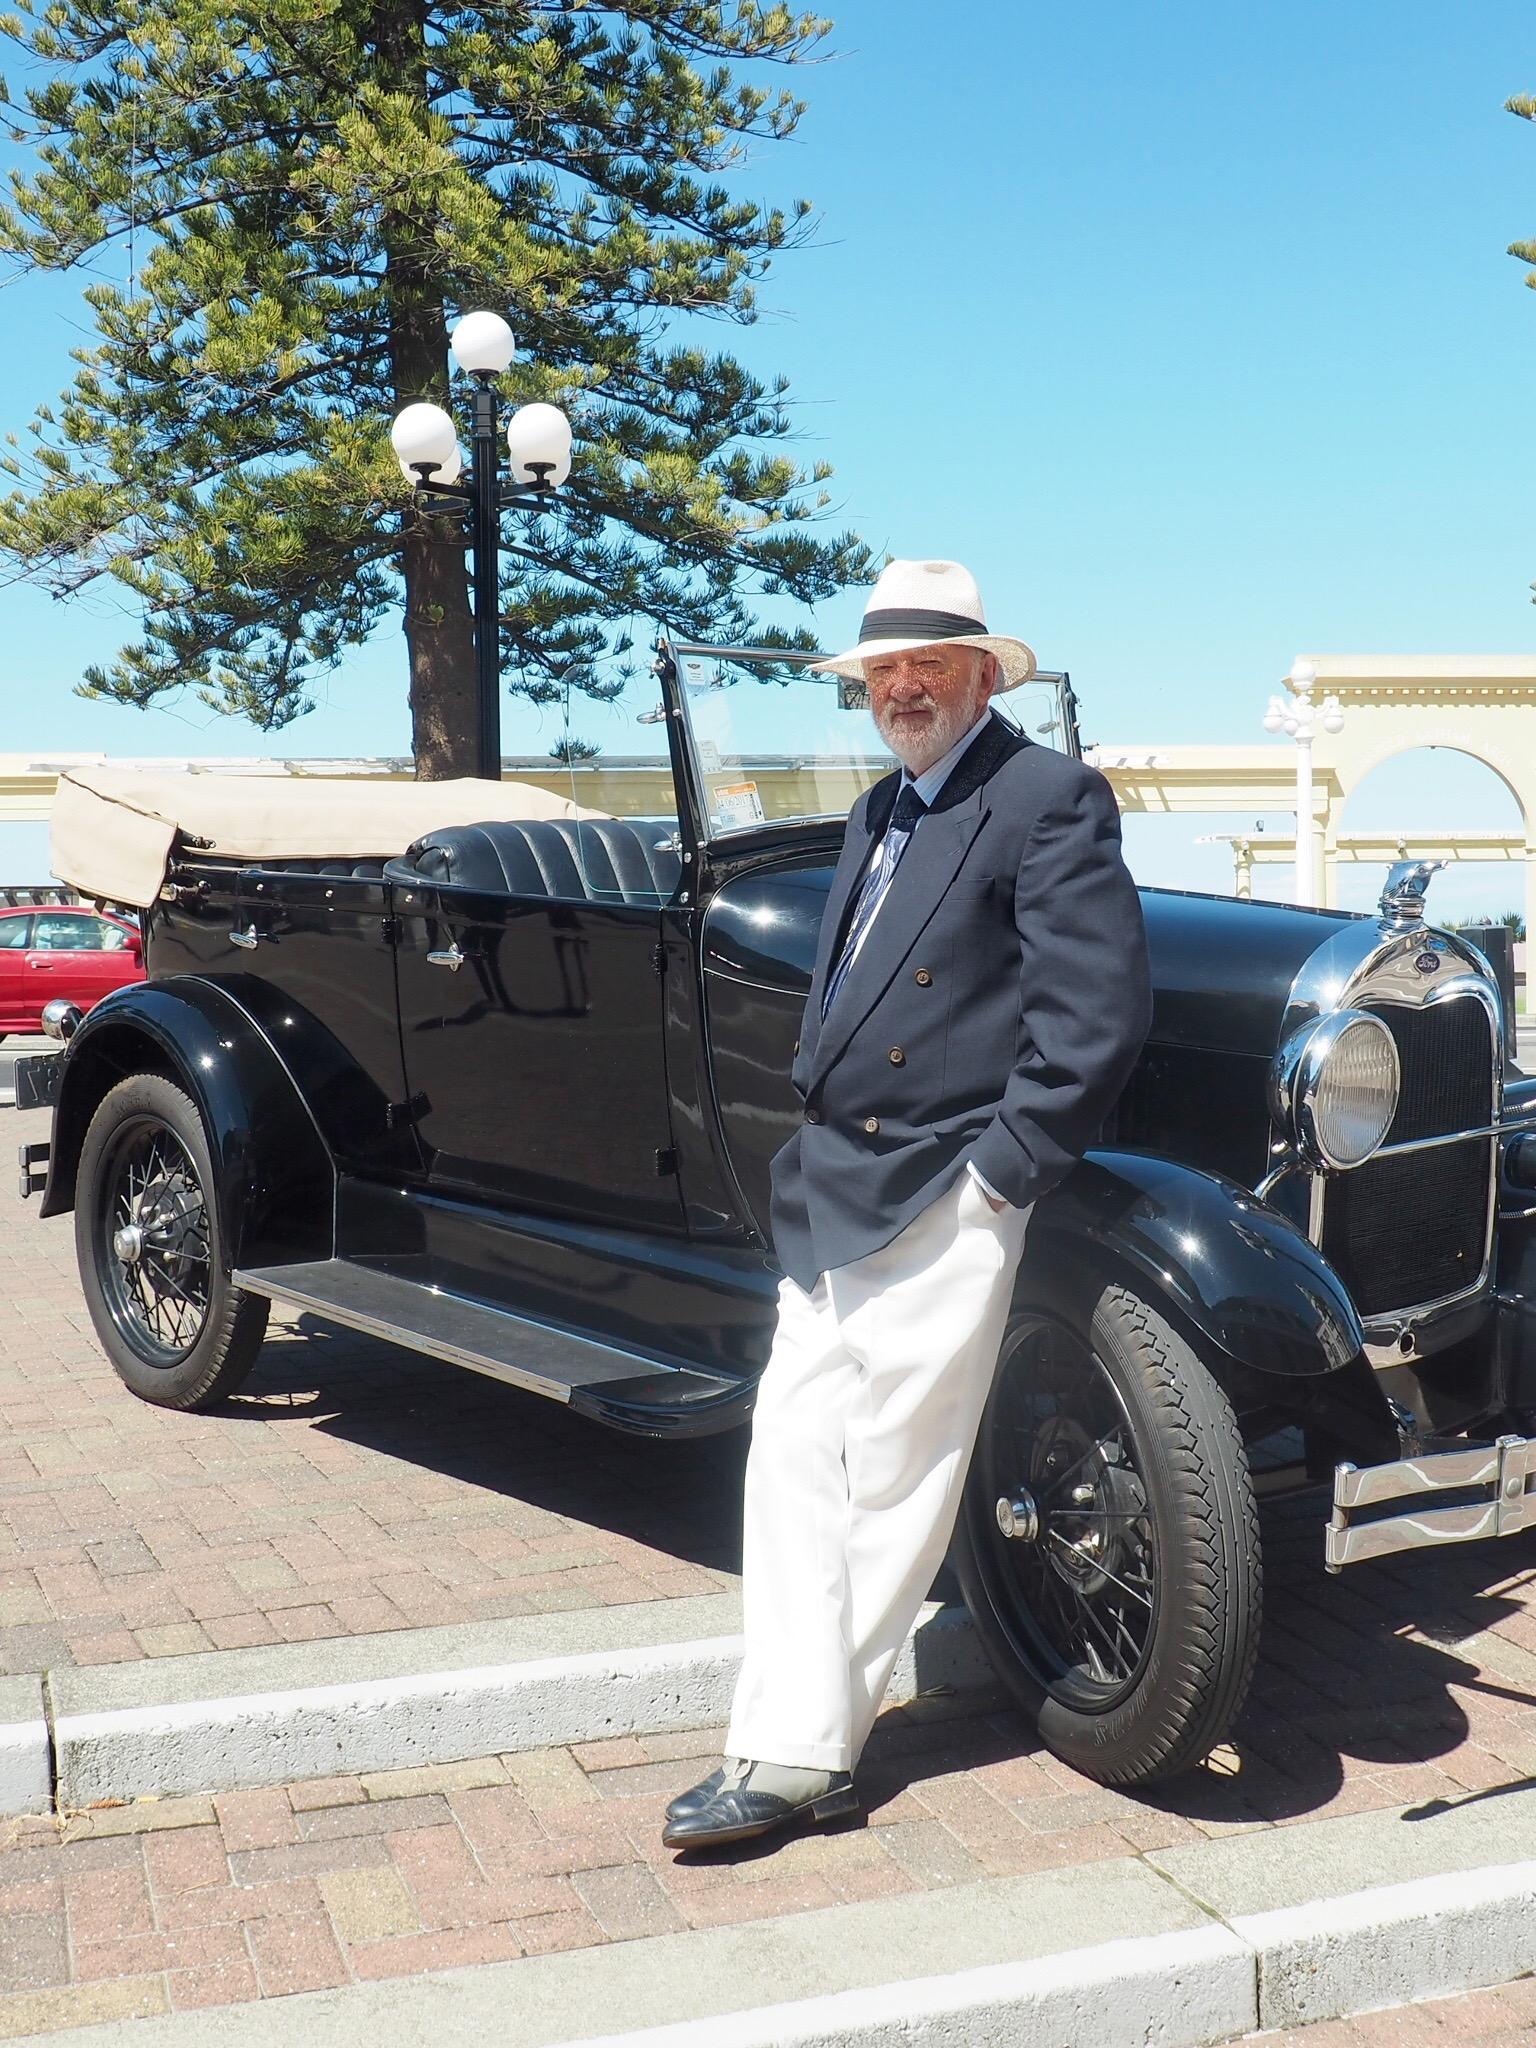 Leigh Patterson & his vintage car. Napier. New Zealand.